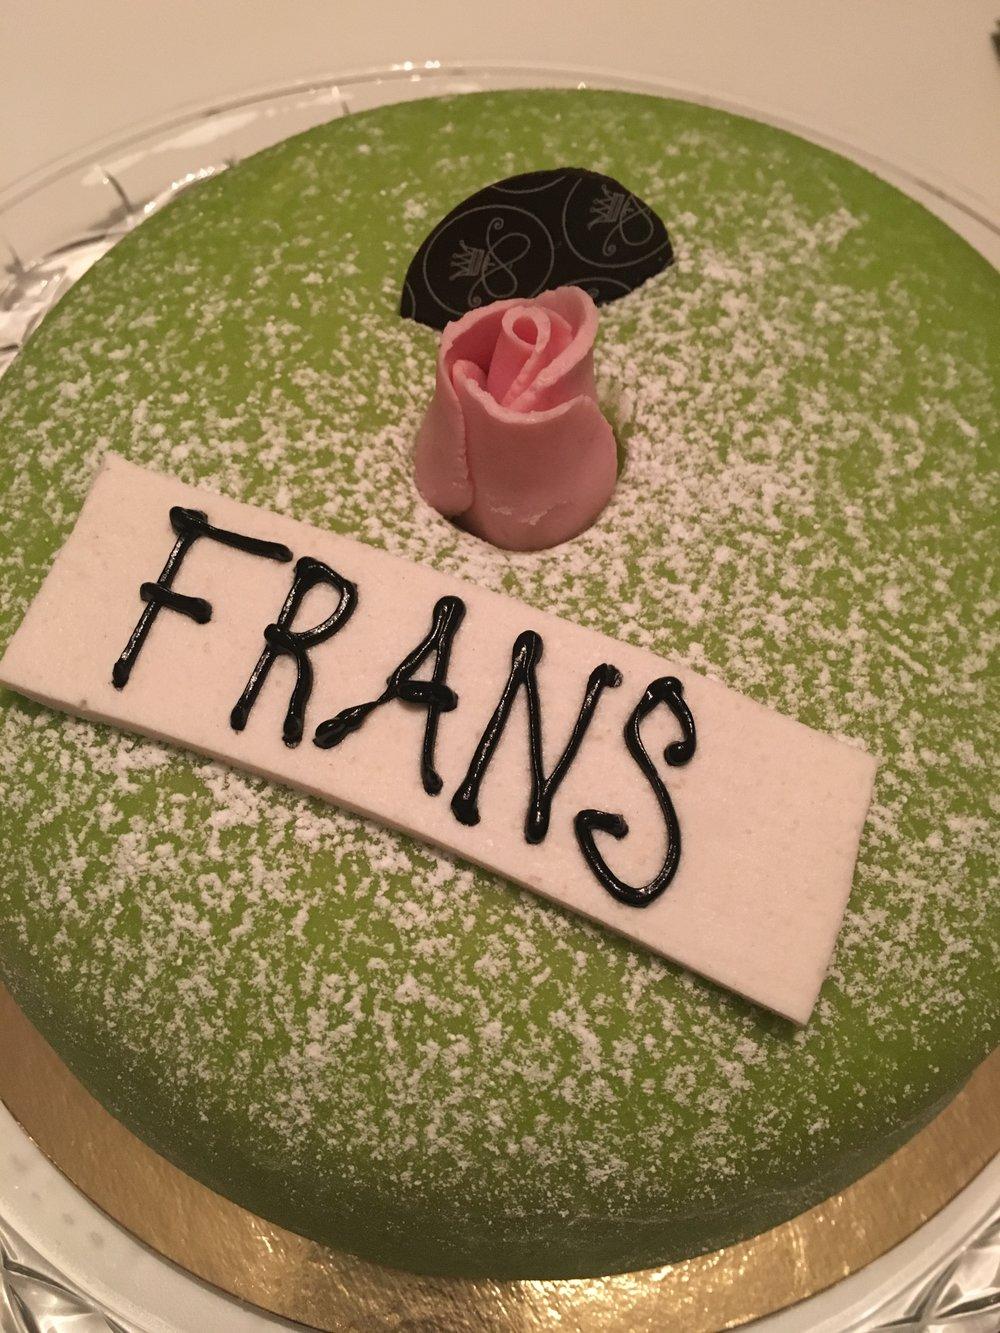 frans tårta.jpg